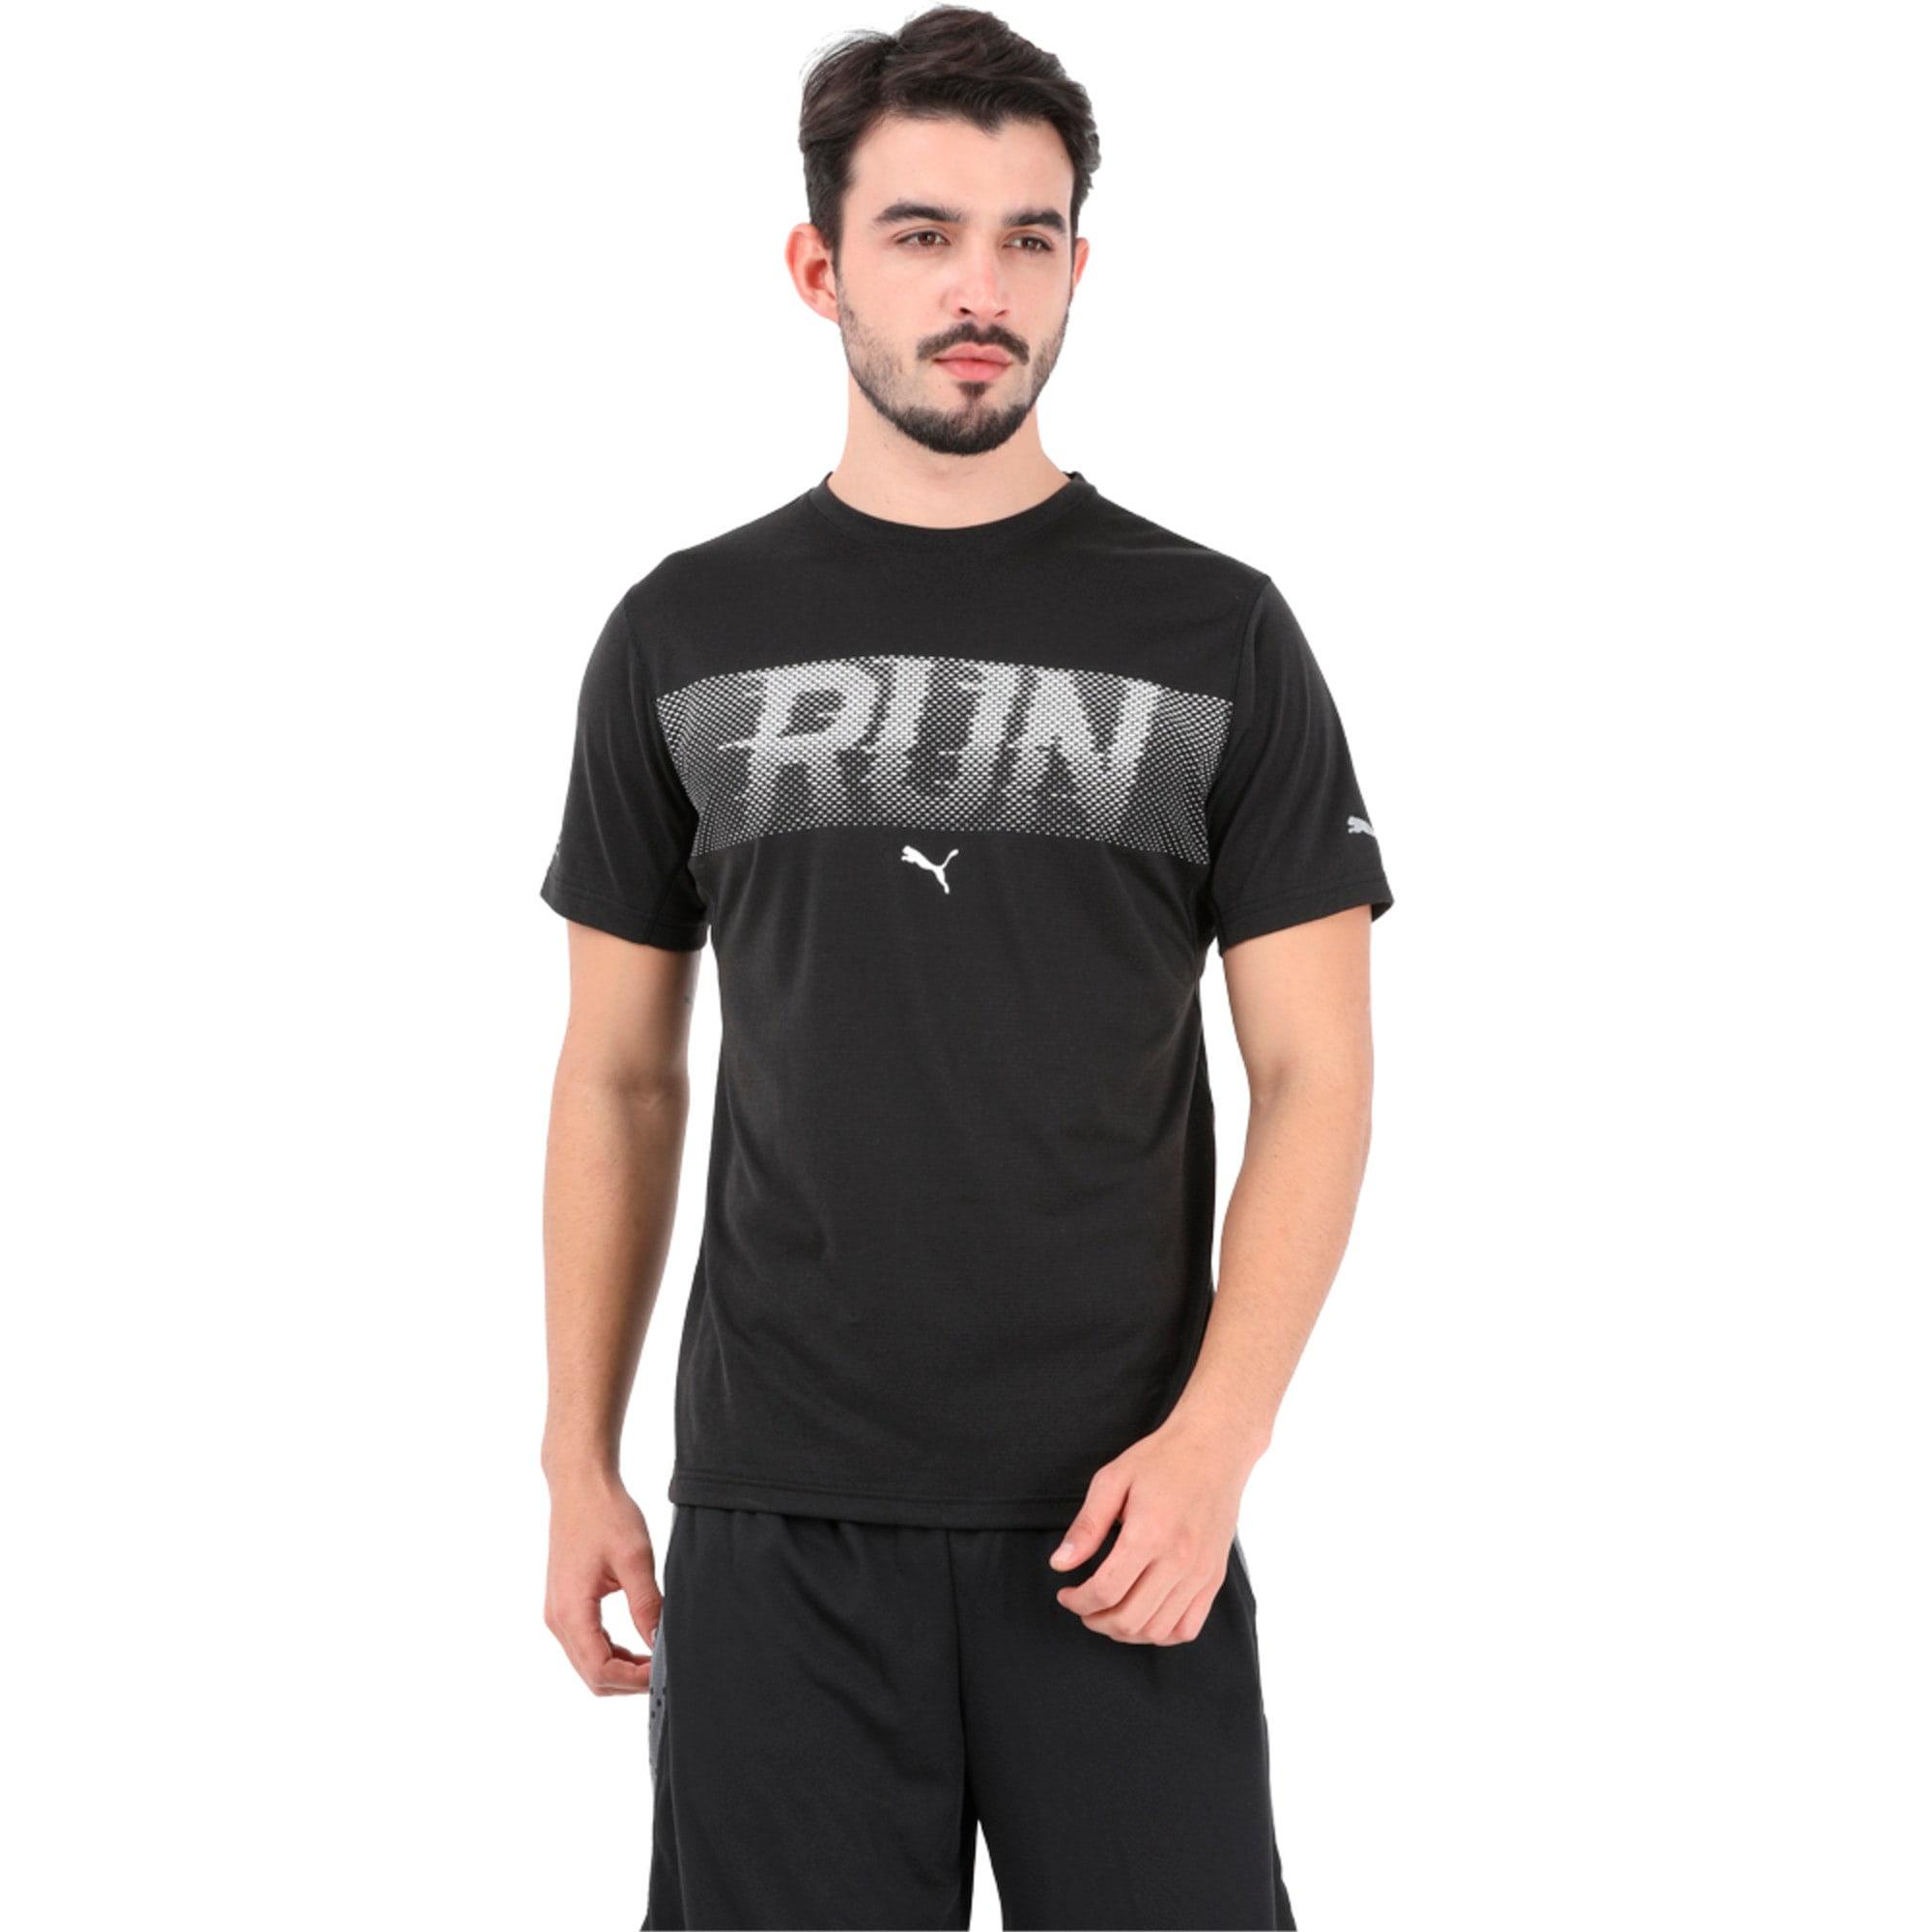 Thumbnail 3 of Run S S Tee, Puma Black, medium-IND